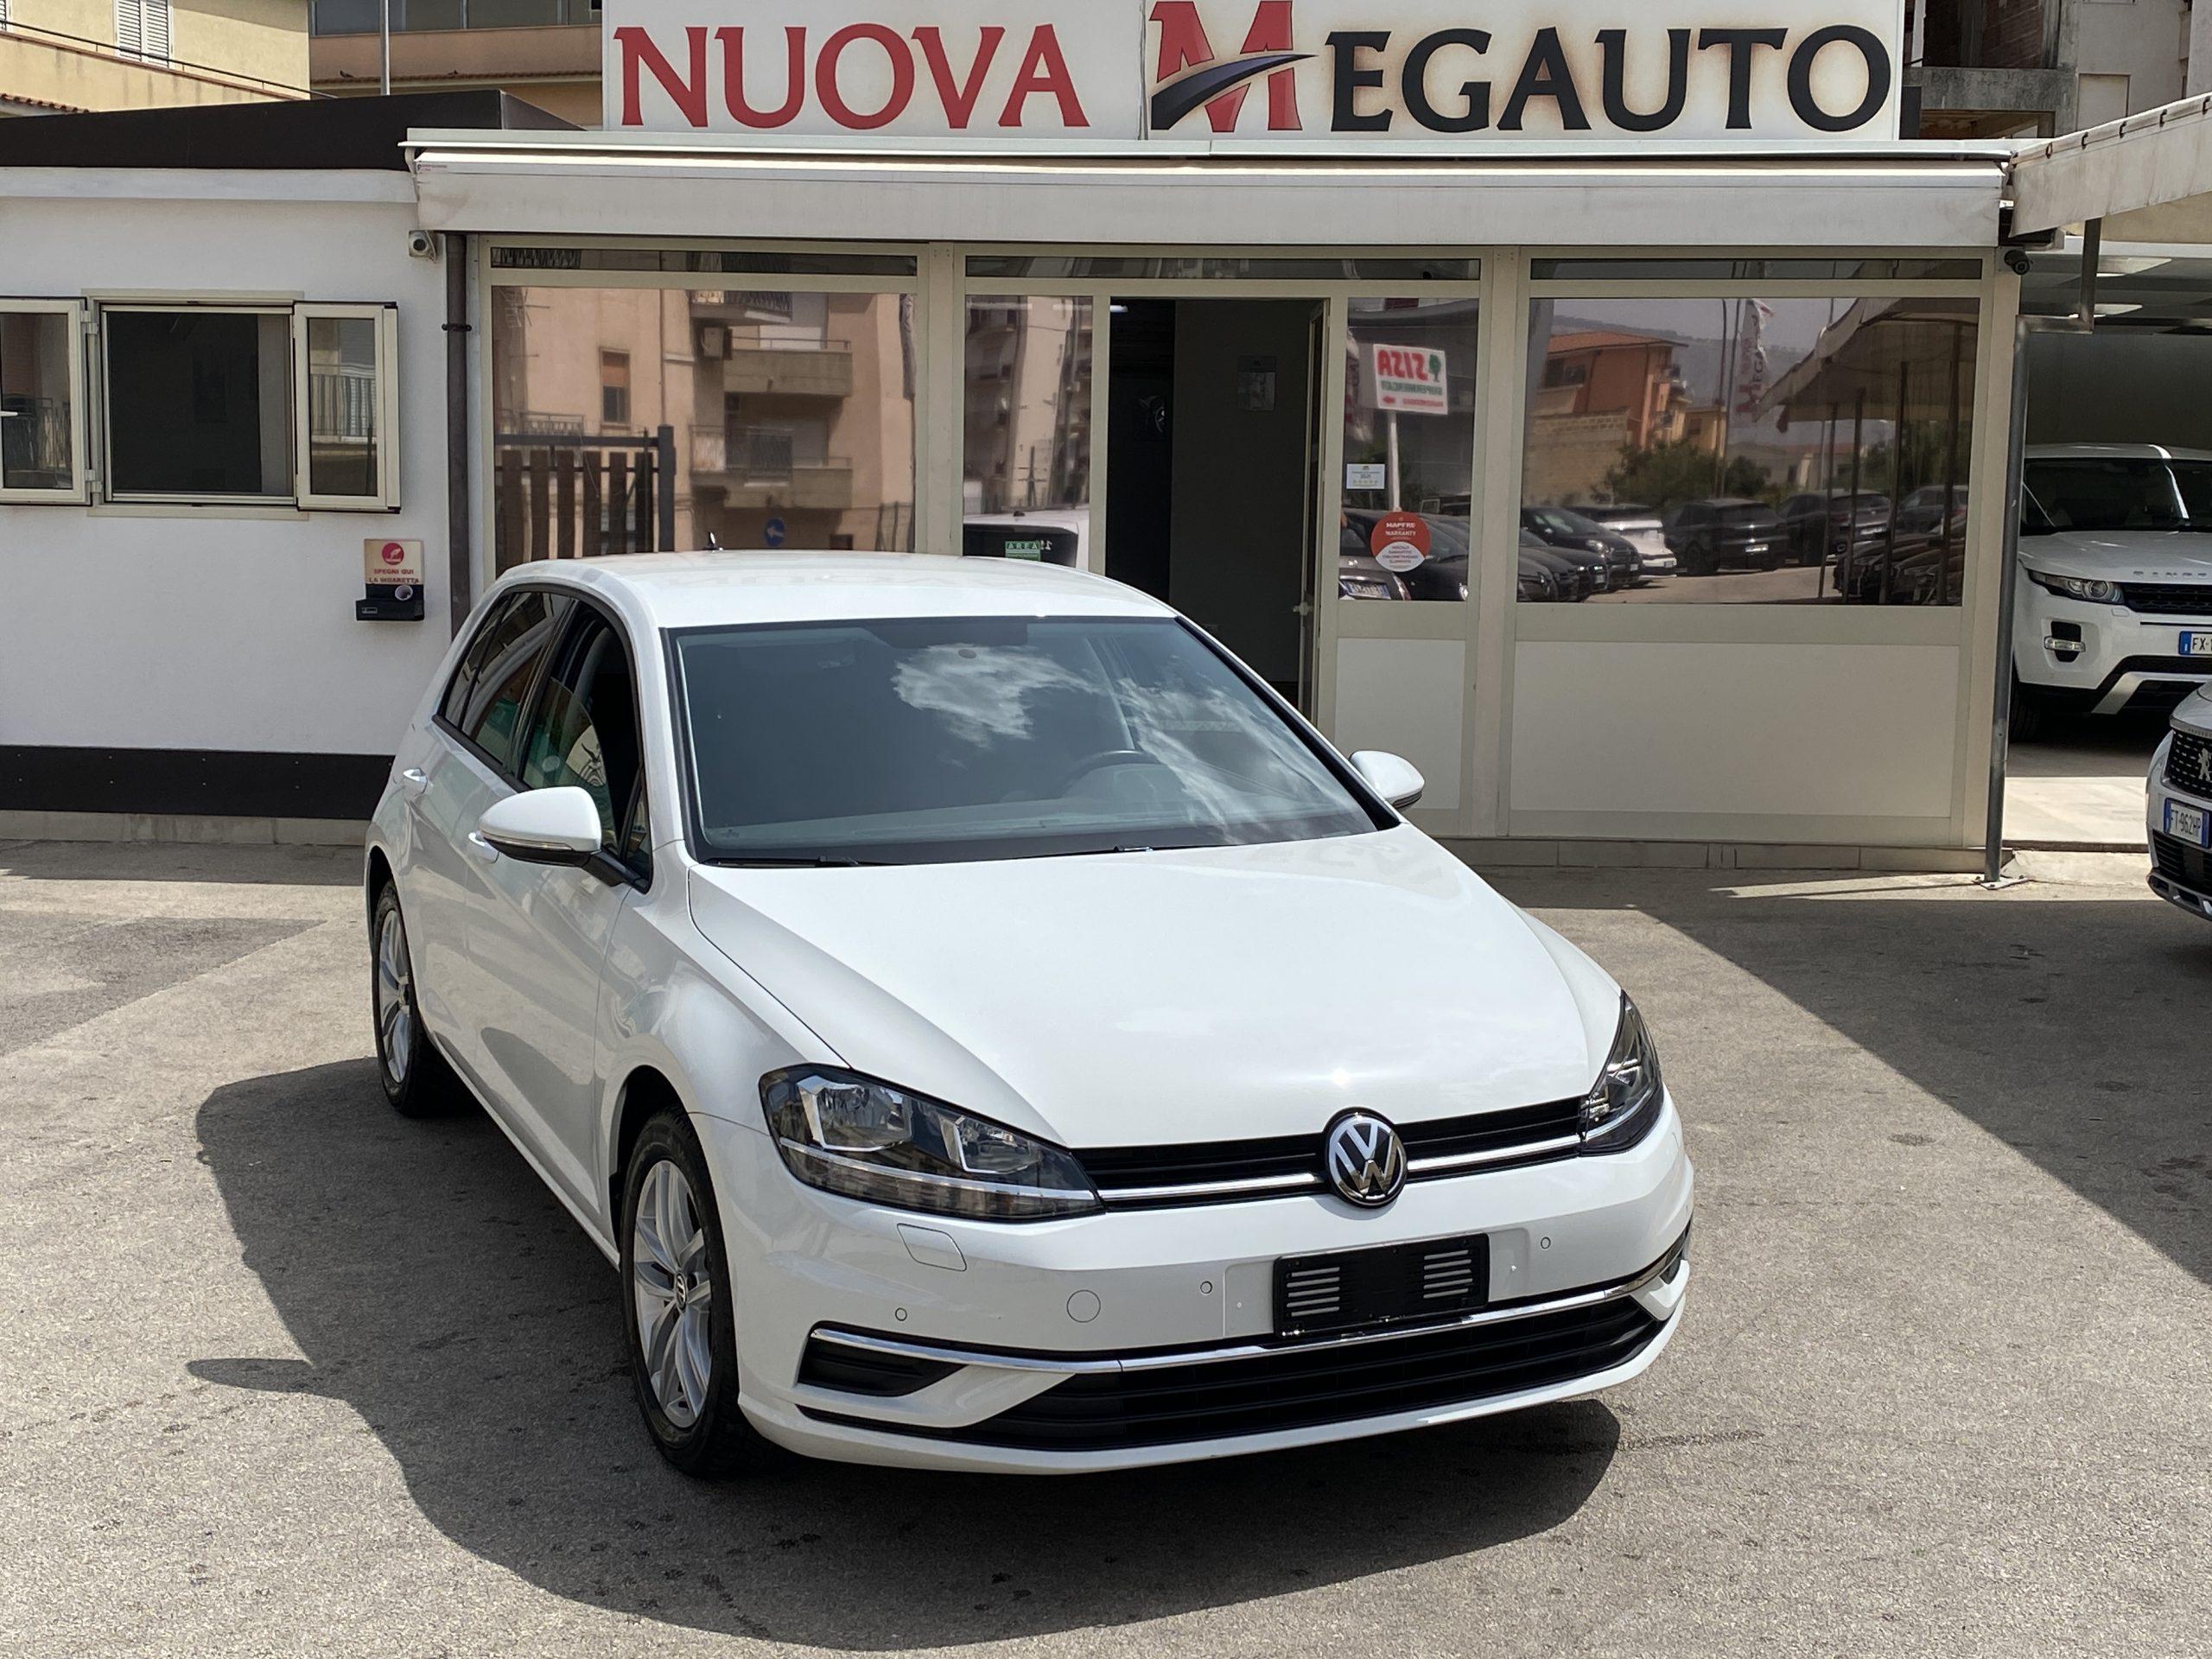 Volkswagen Golf 1.6 TDI 115 CV 5p. Business BlueMotion Technology 2019